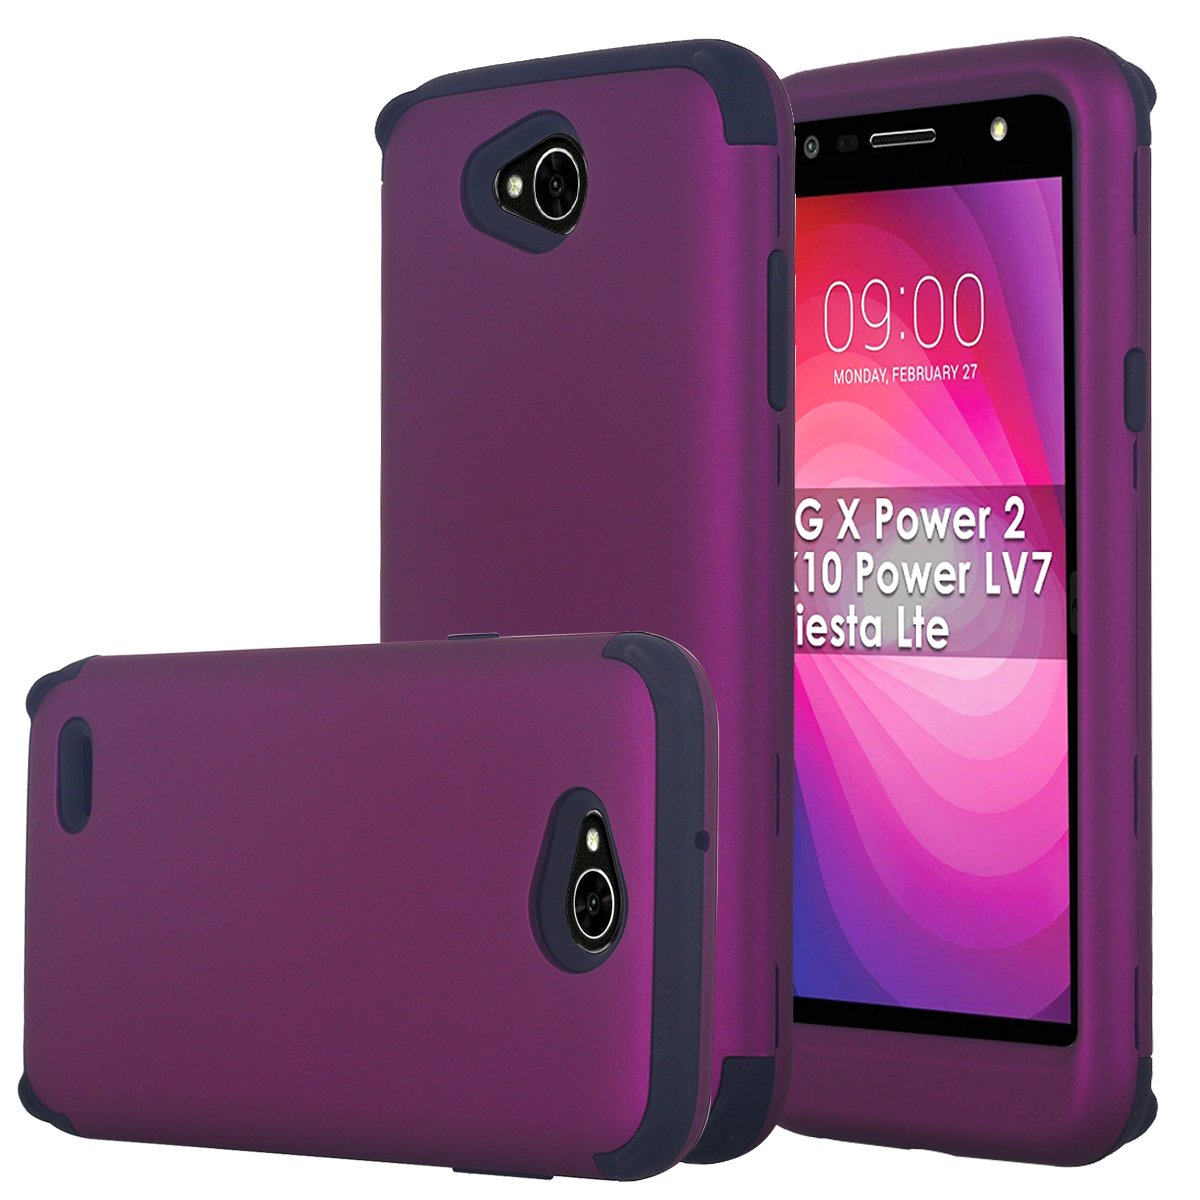 LG X Power 2 Case, LG Fiesta LTE Case, LG K10 Power Case, LG X Charge Case Shockproof Hybrid Hard Plastic + Flexible TPU Armor Impact Case for LG X Power 2/LG LV7/LG Fiesta 2 LTE, Purple/Black